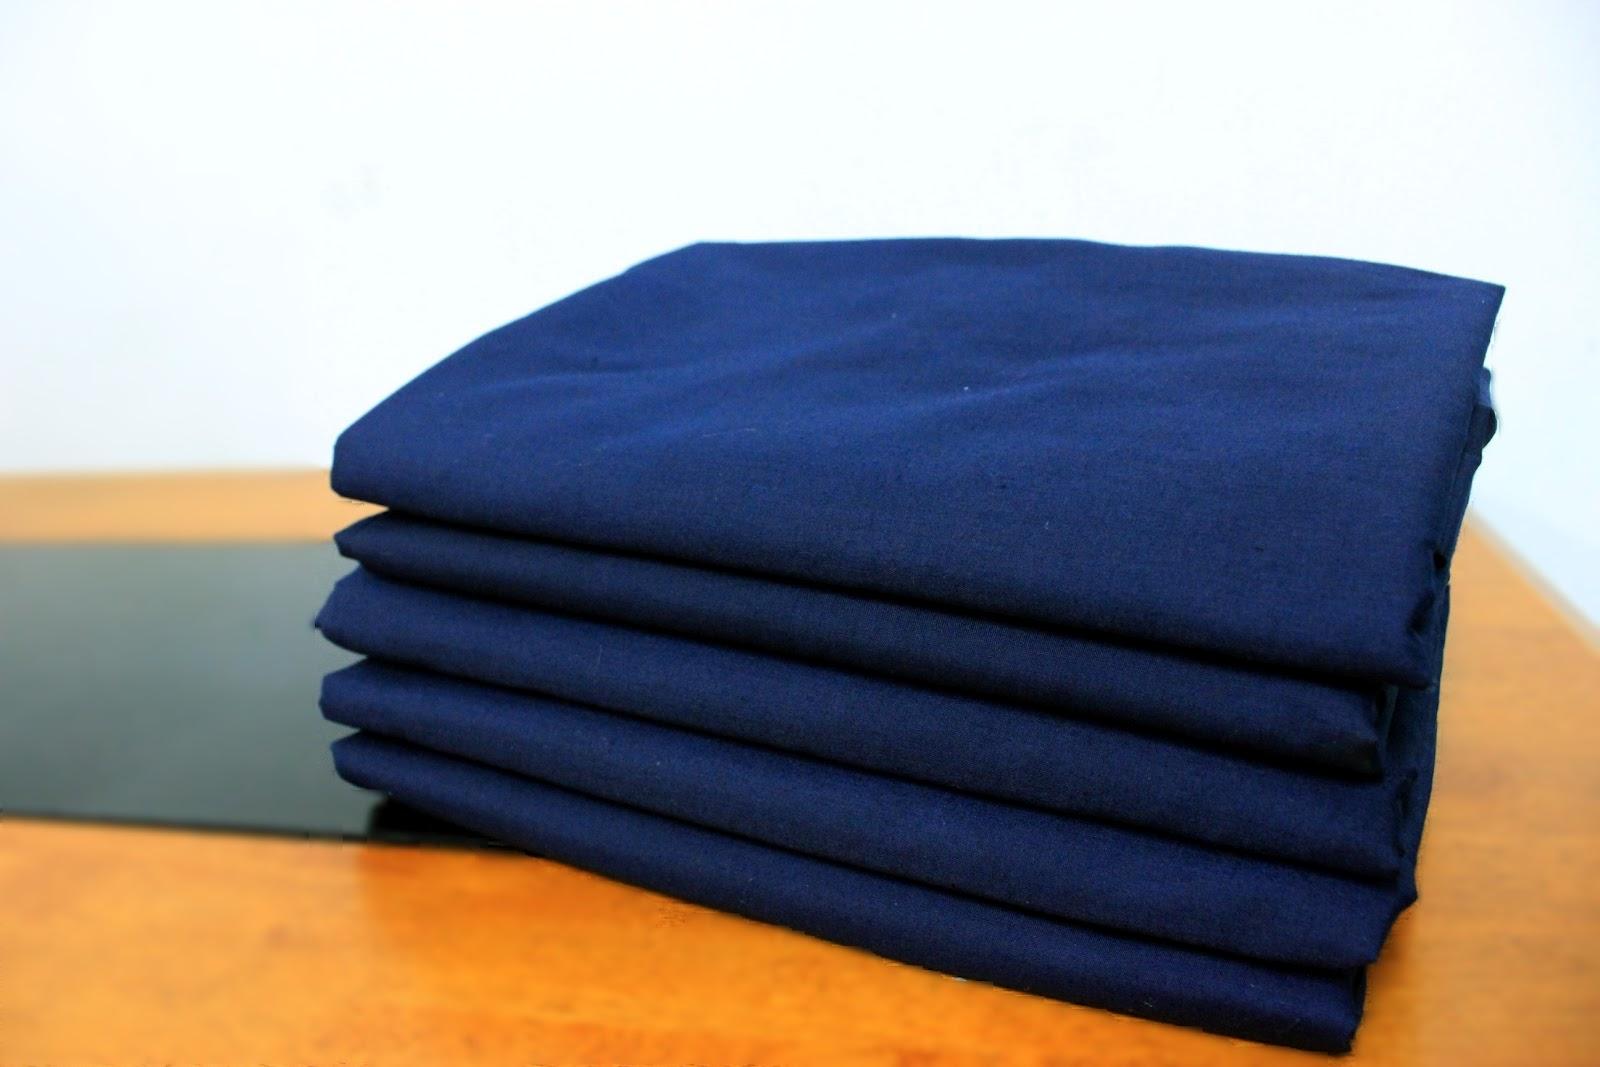 Set Cadar Bergetah Fitted Saiz Single Warna Navy Blue